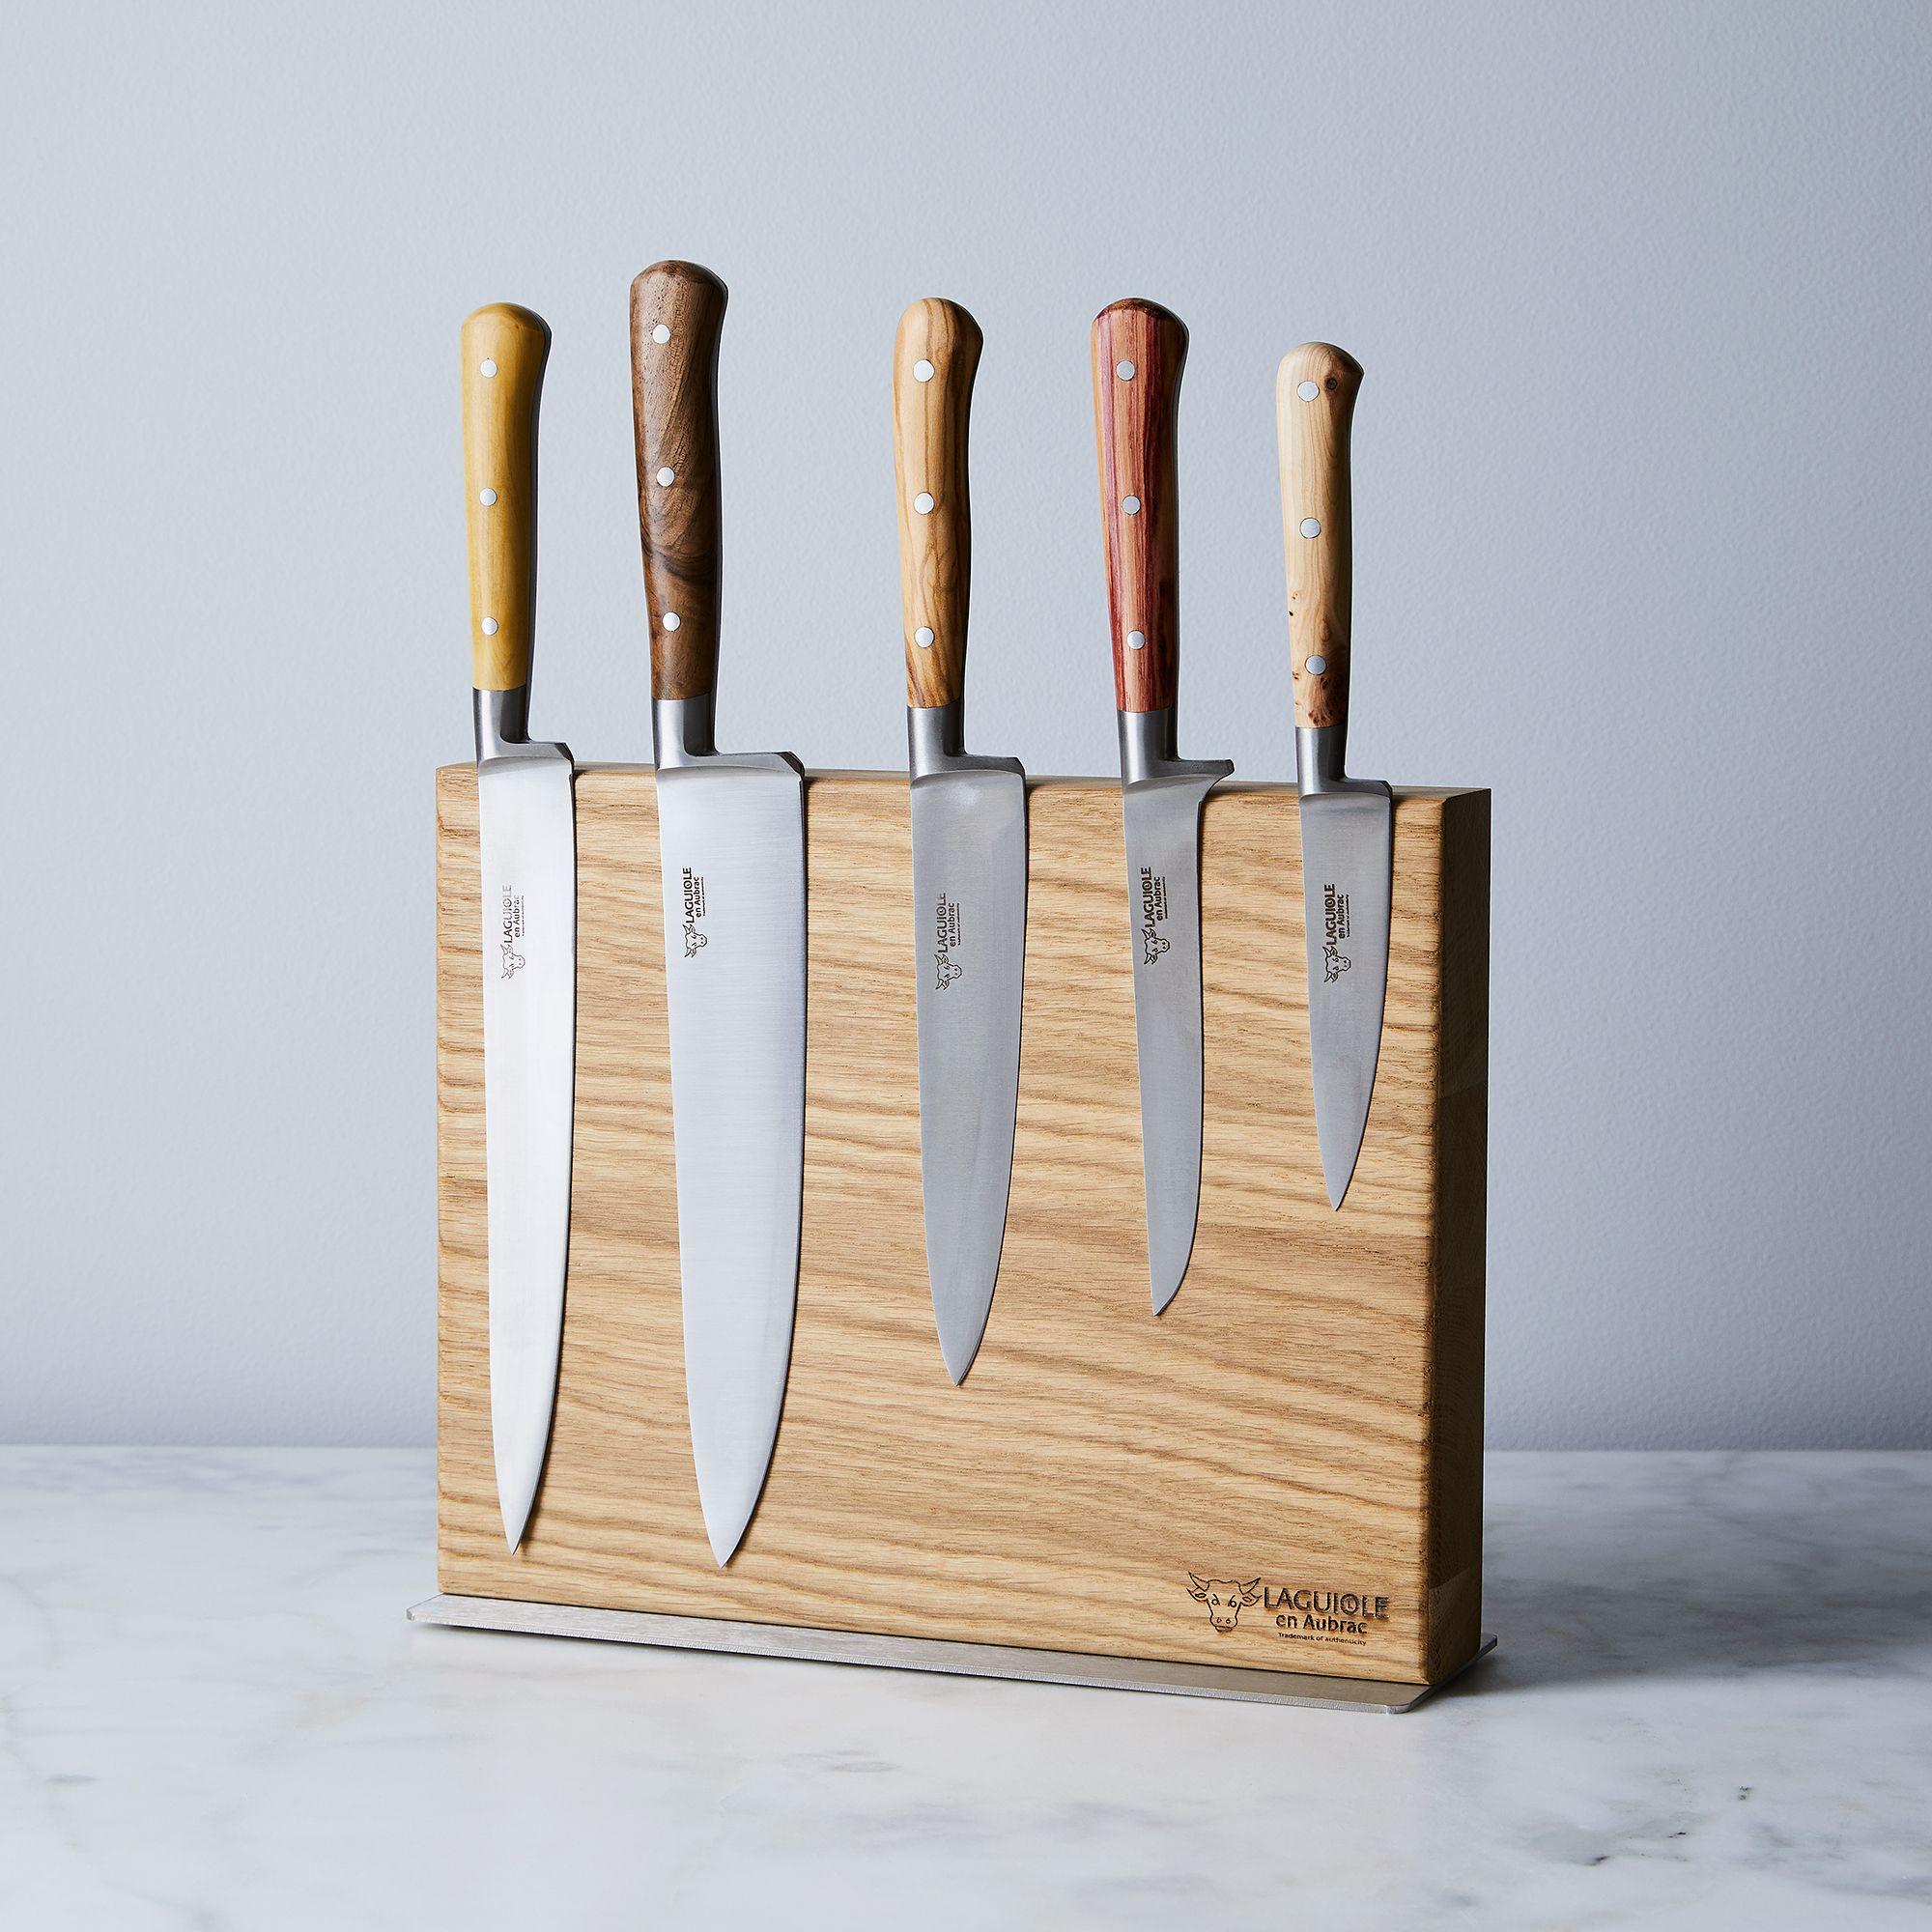 Laguiole en Aubrac Mixed Wood Knife Set & Magnetic Block on Food52